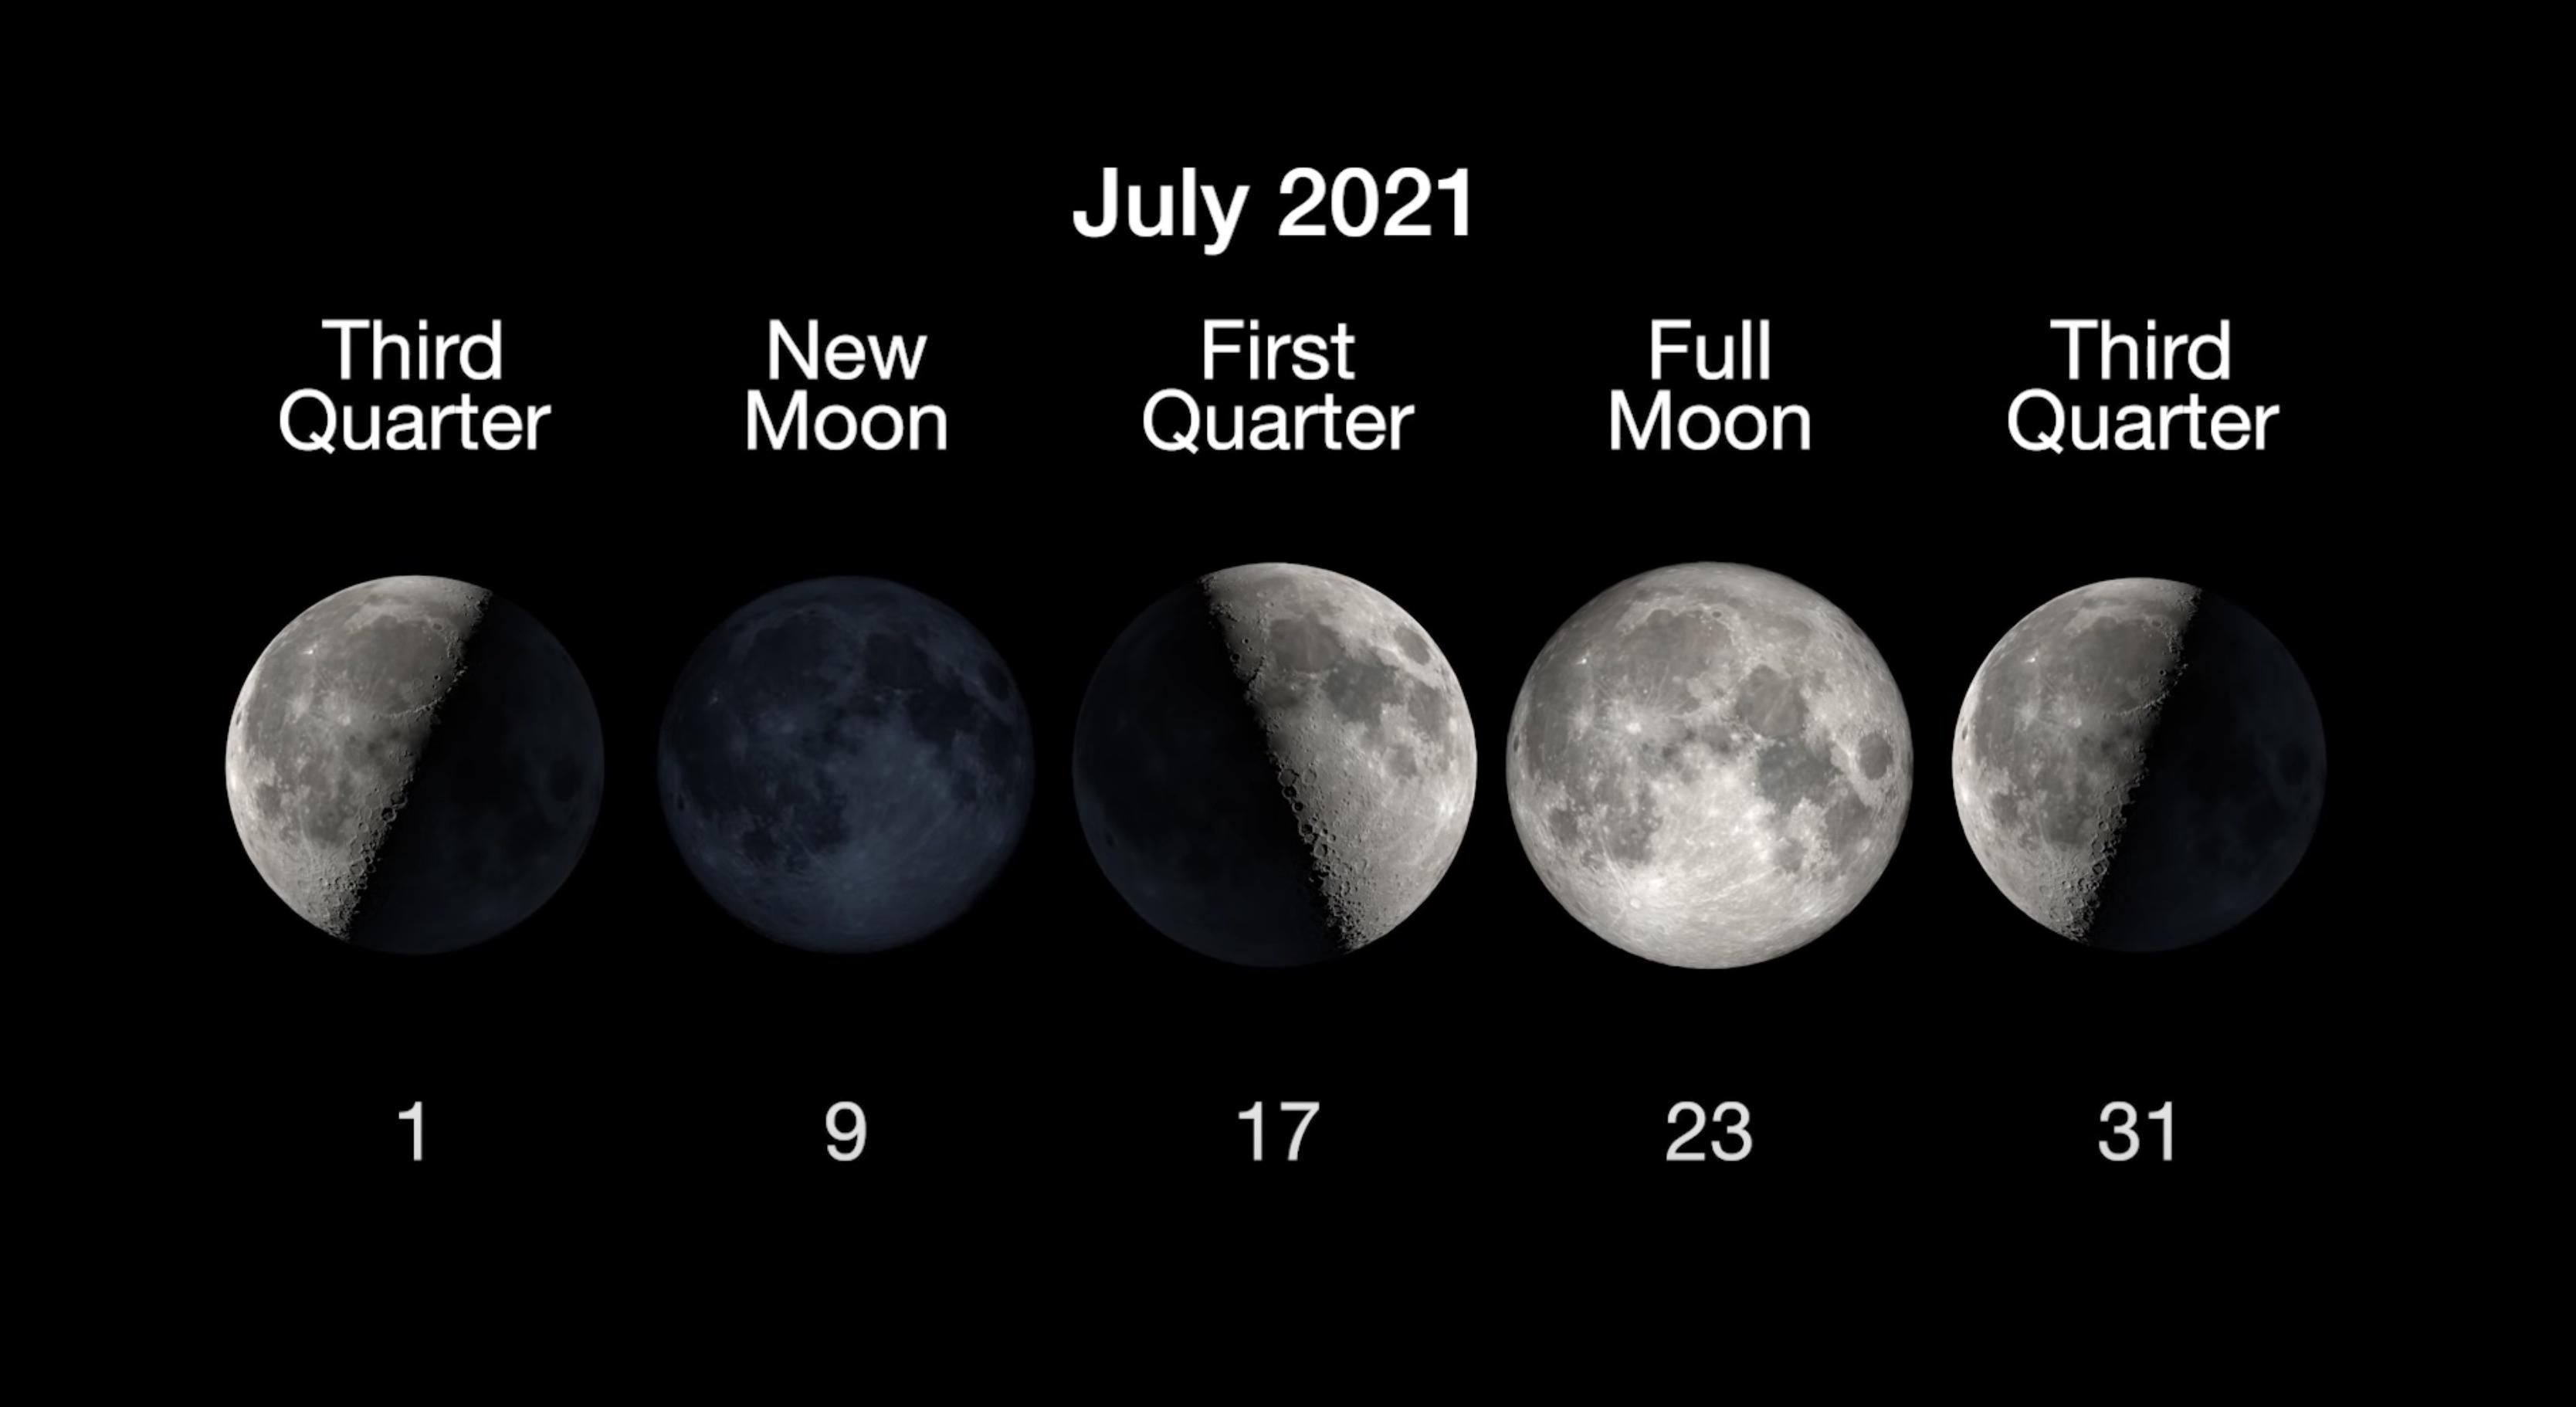 Full Moon Calendar 2021: When To See The Next Full Moon | Space July 2021 Lunar Calendar